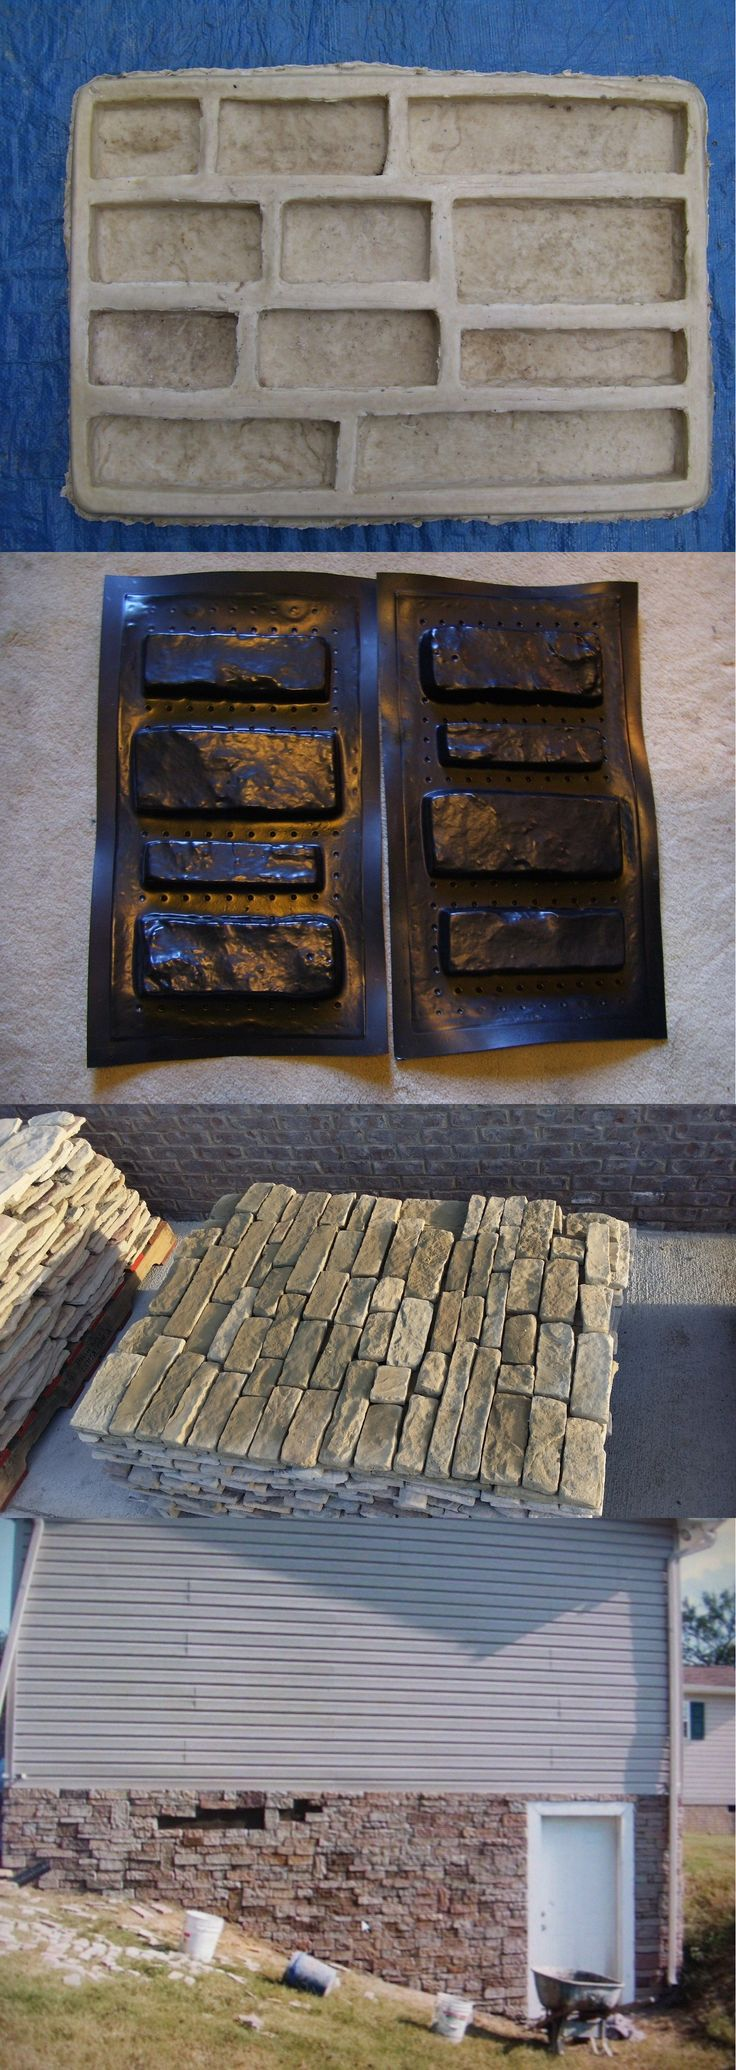 Decorative Stepping Stones 118863: Ledgestone Veneer Concrete Latex Rubber Mold.Plus 1 Free Ledgestone Plastic Mold -> BUY IT NOW ONLY: $139 on eBay!